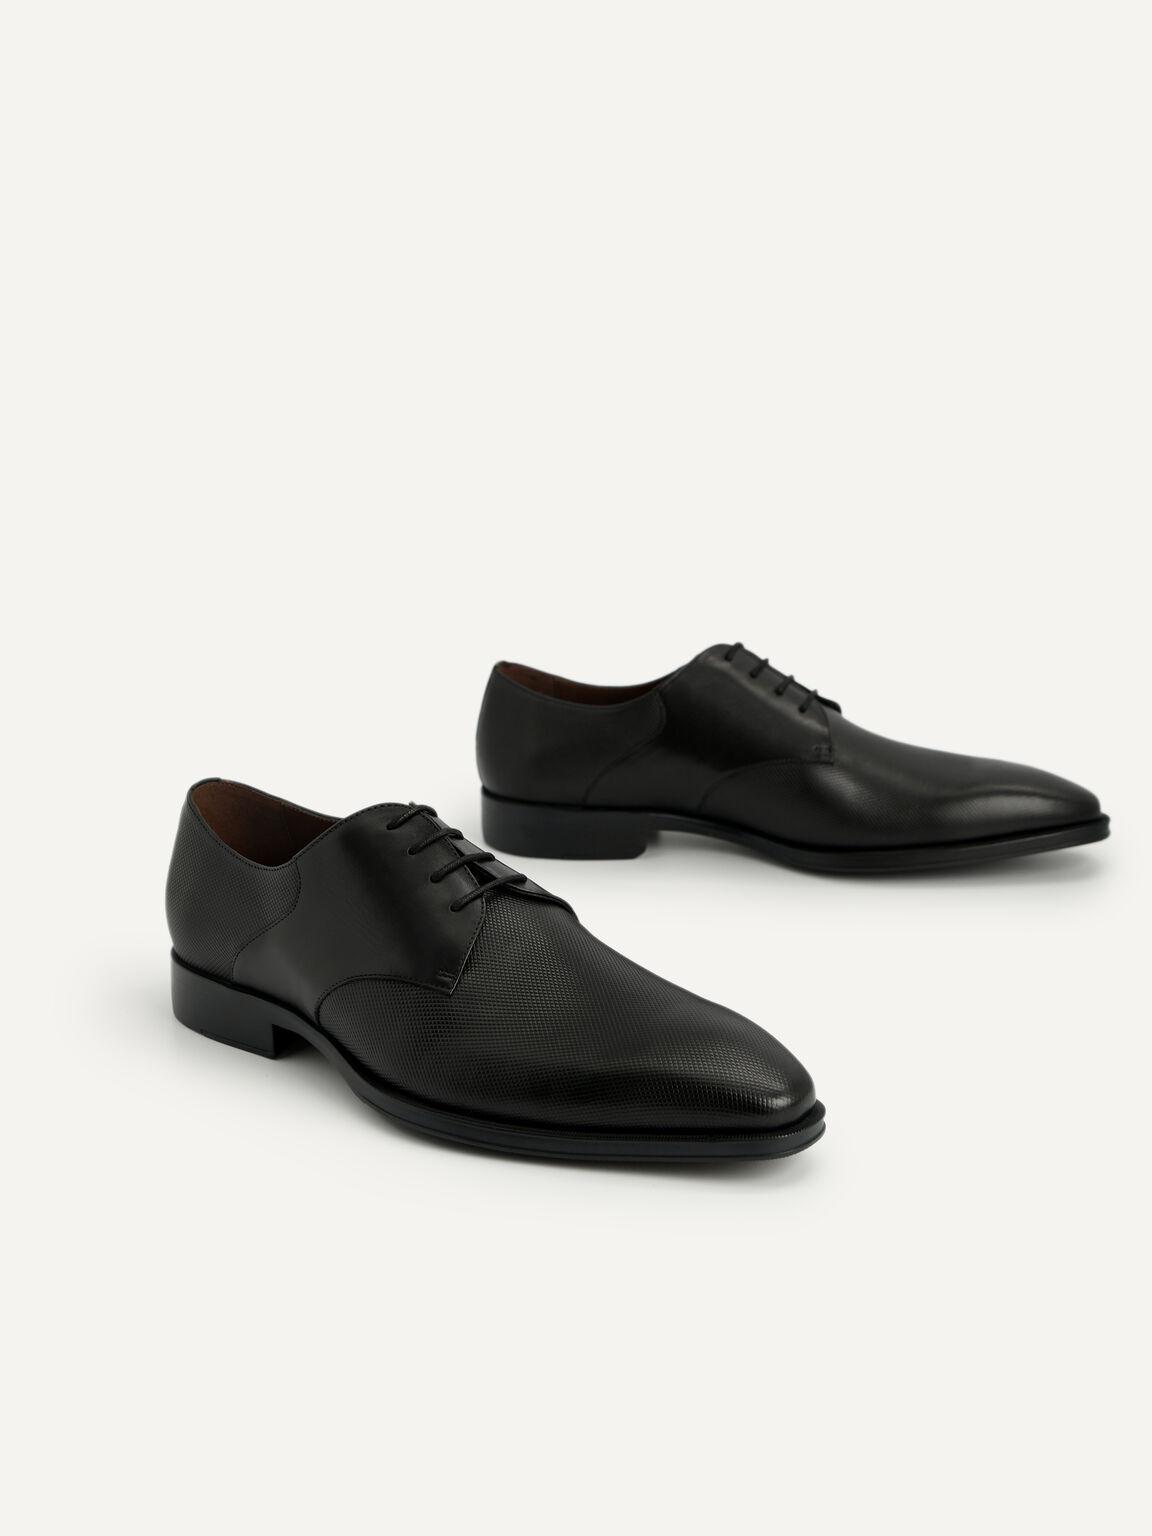 Textured Leather Derby Shoes, Black, hi-res